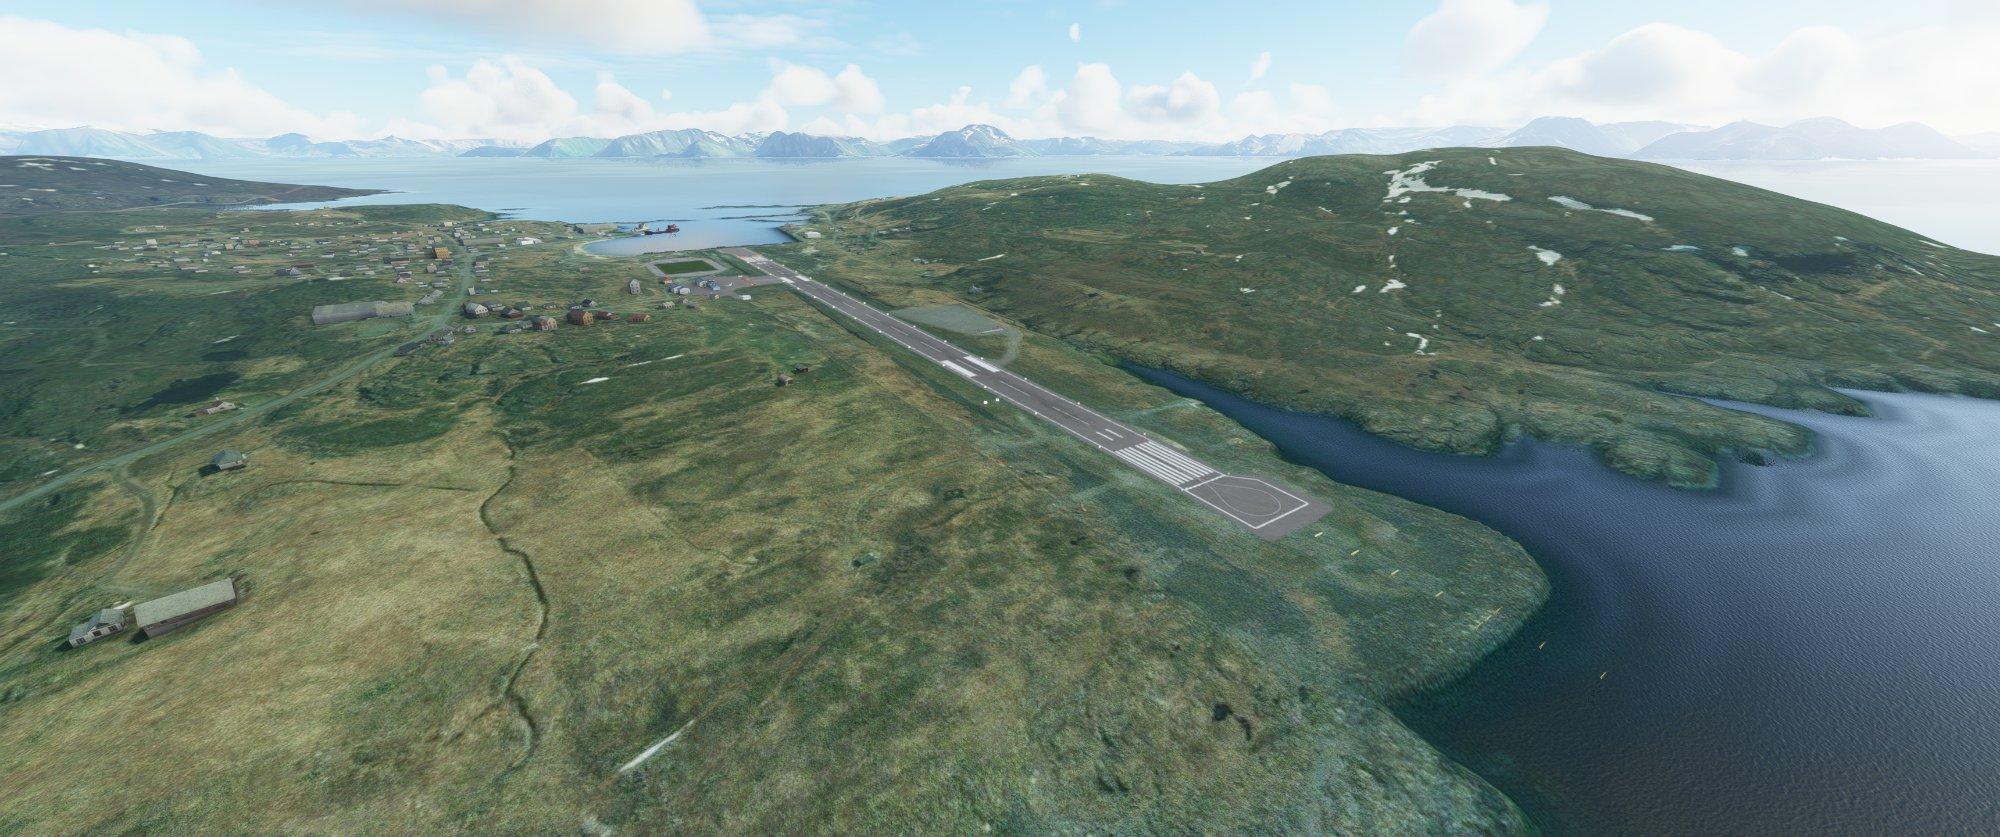 Microsoft Flight Simulator Screenshot 2020.11.19 - 15.42.03.27.jpg